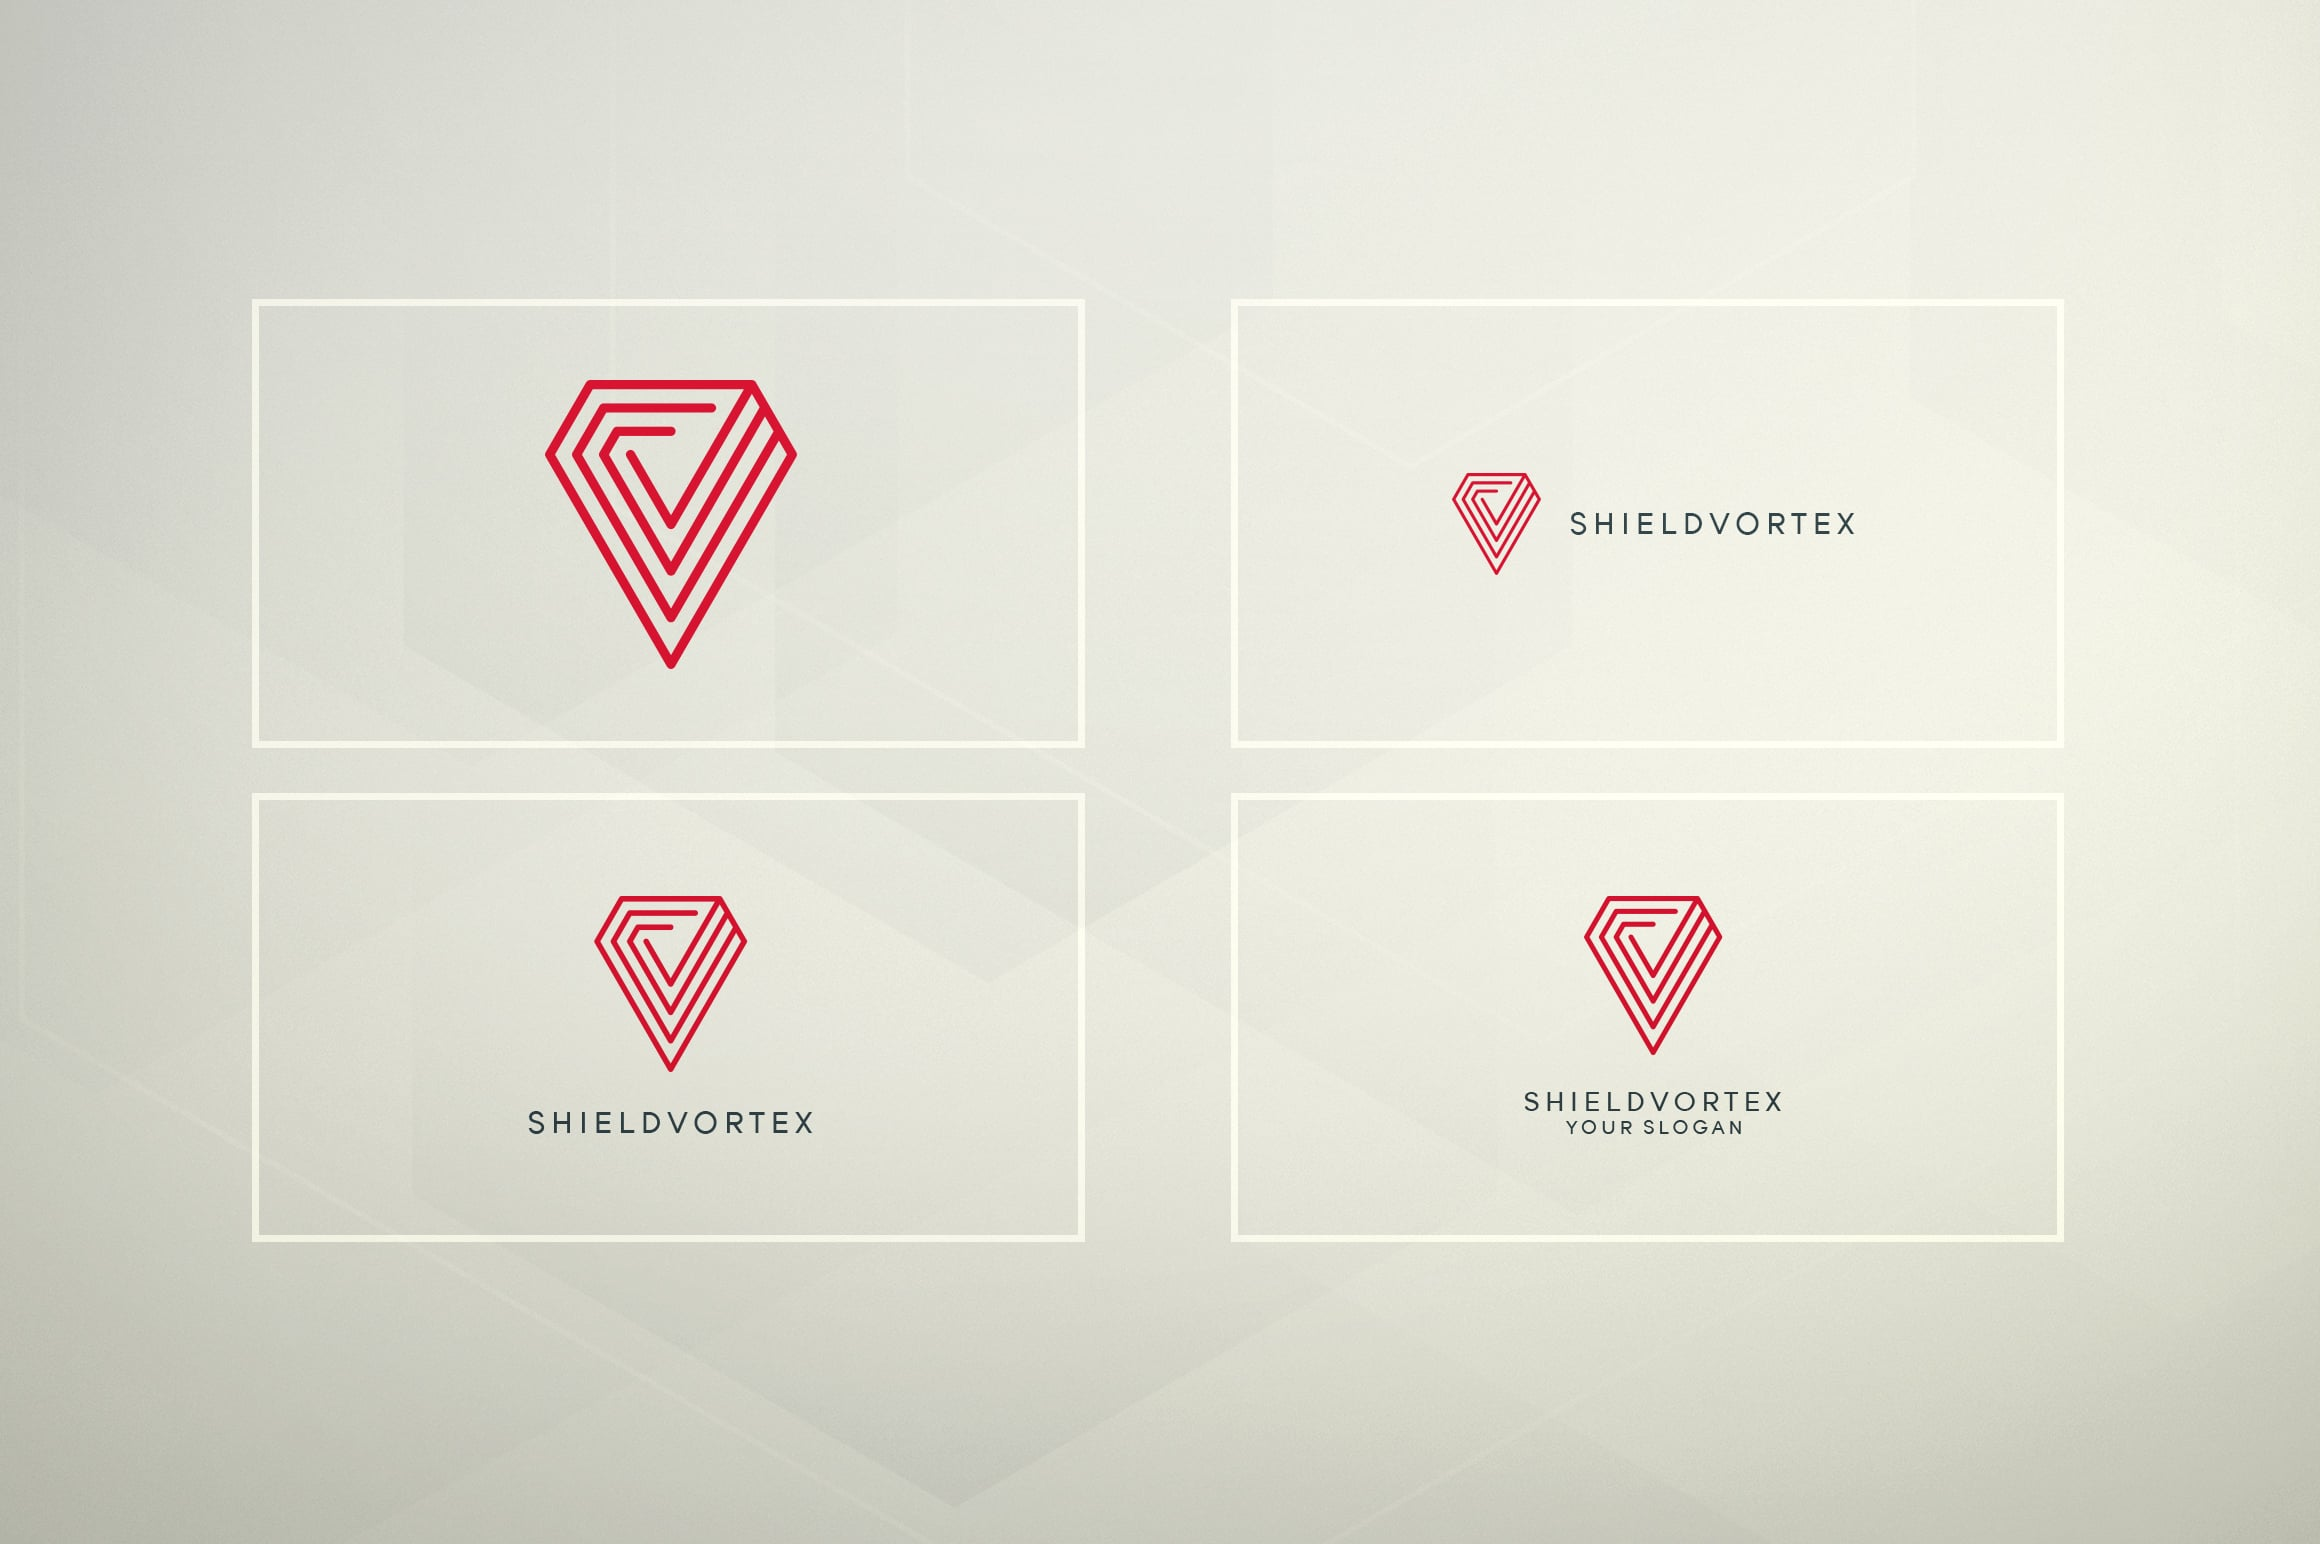 17 Geometric Animal Icons and Logos - 28